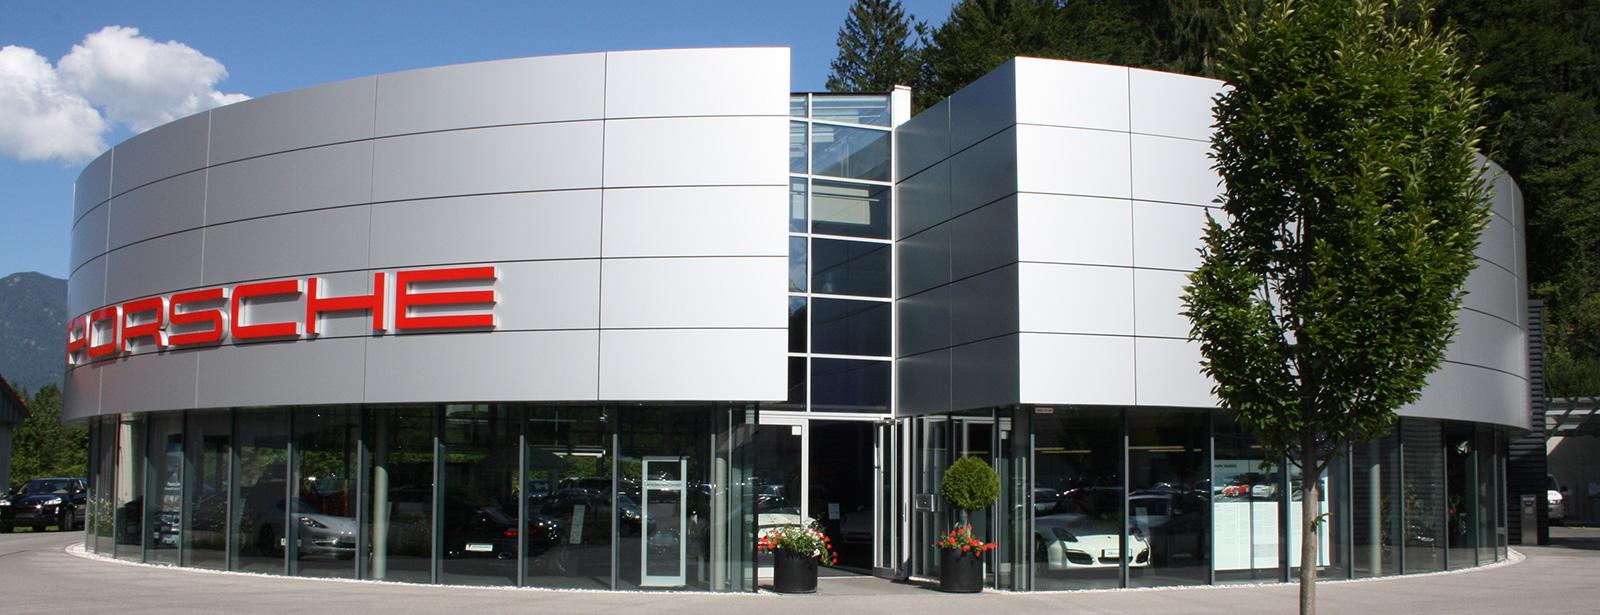 Porsche Centre Garmisch-Partenkirchen